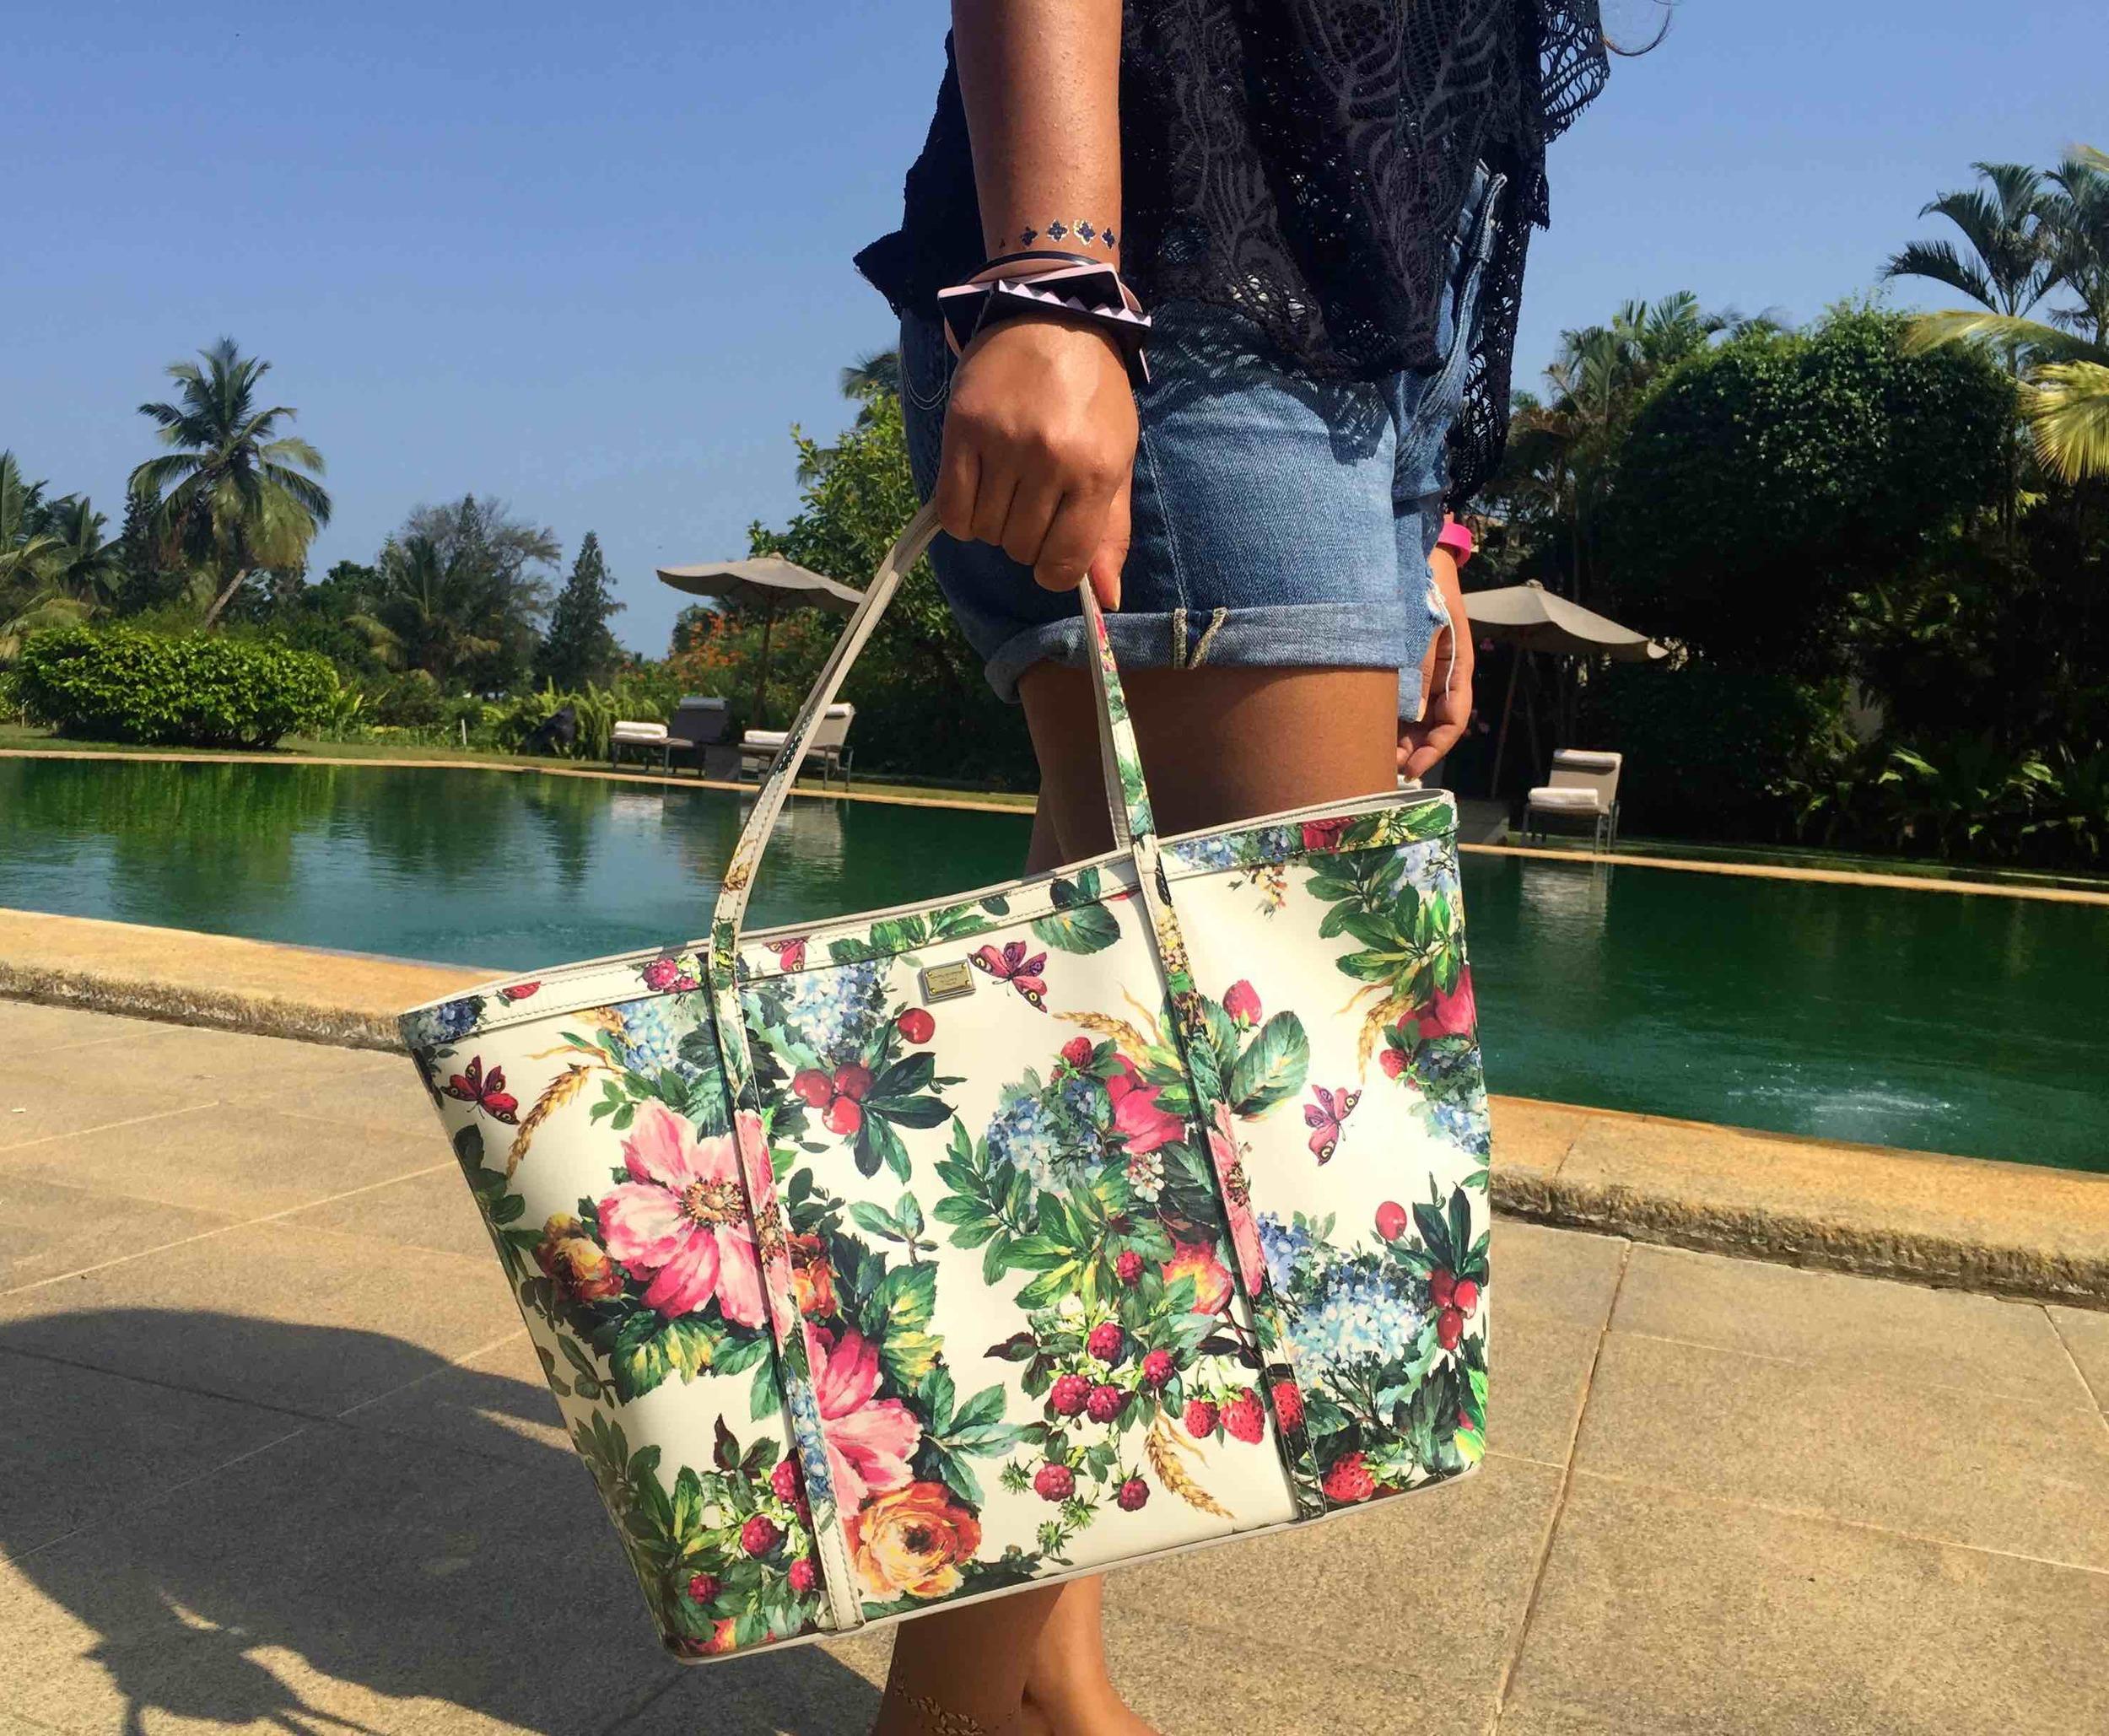 Bathing Suit: Ralph Lauren, Shorts: Adriano Goldschmied, Tote: Dolce & Gabbana, Flip-flips: Havaianas, Bangles: Furla, Sunglasses: Gucci